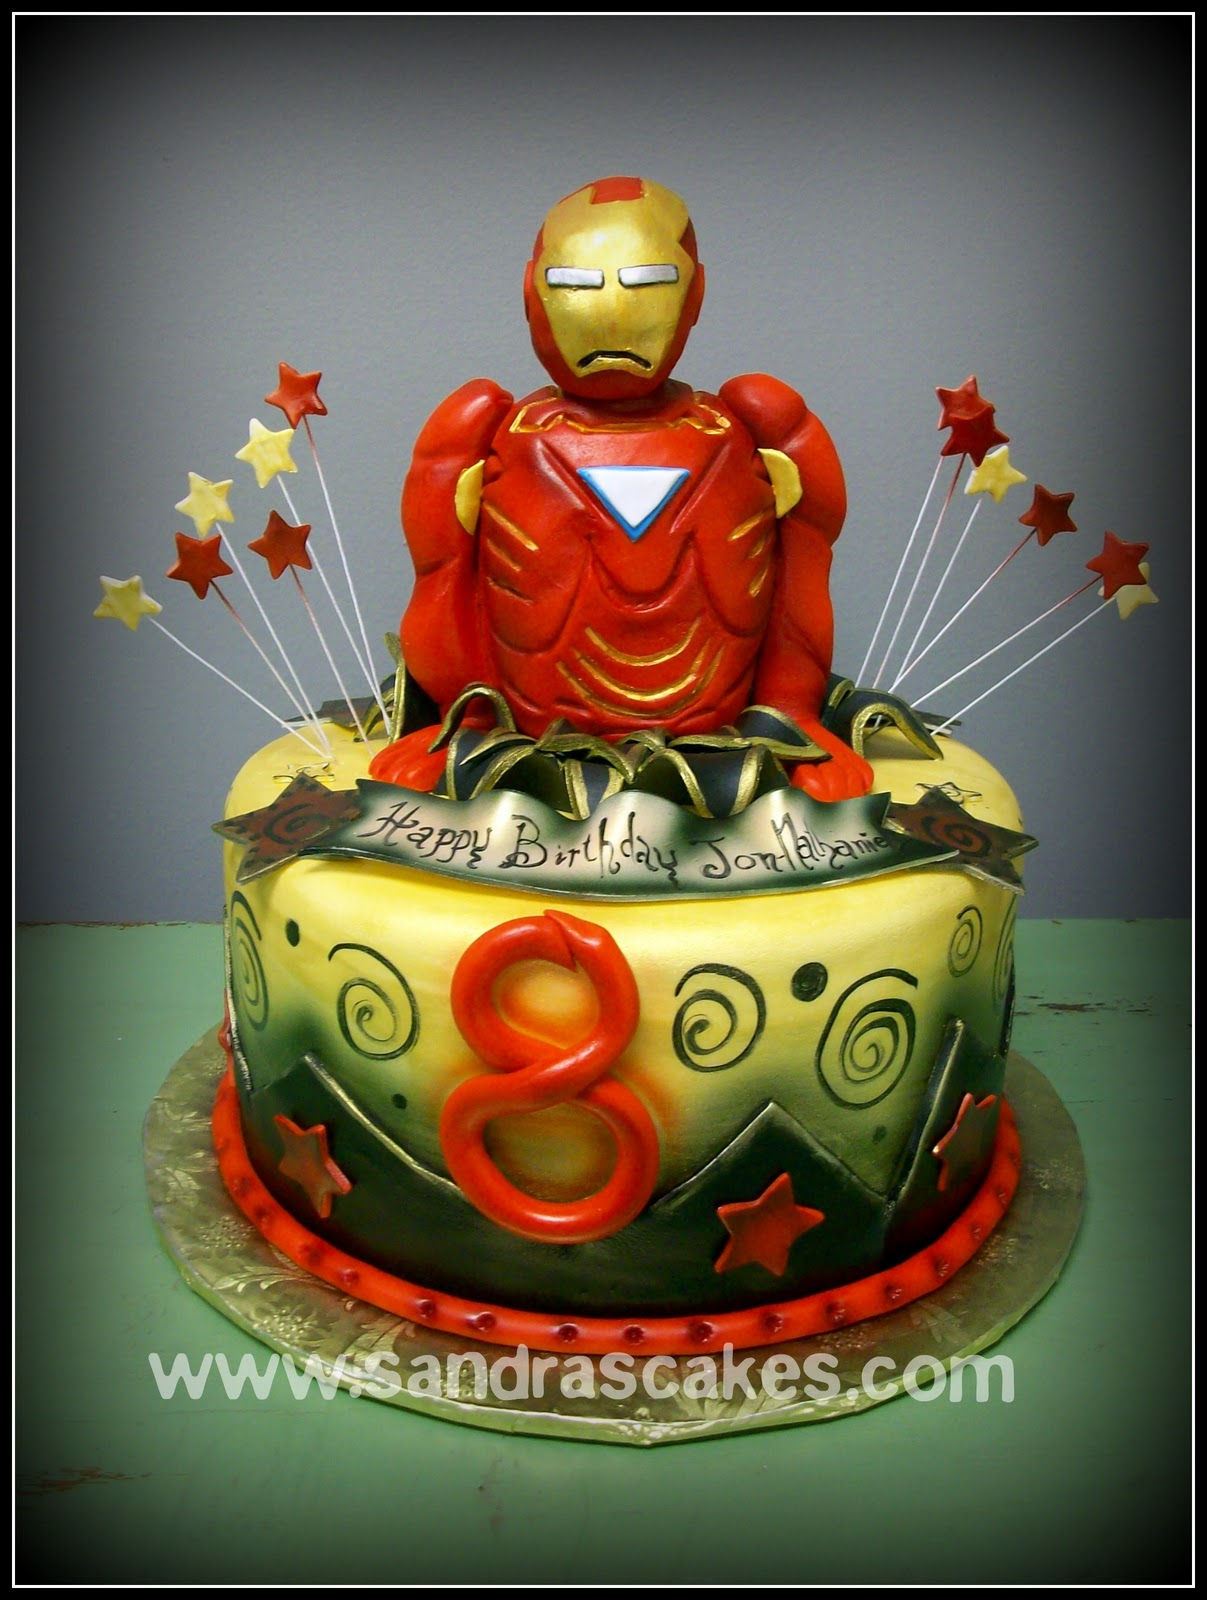 On Birthday Cakes Ironman Birthday Cake